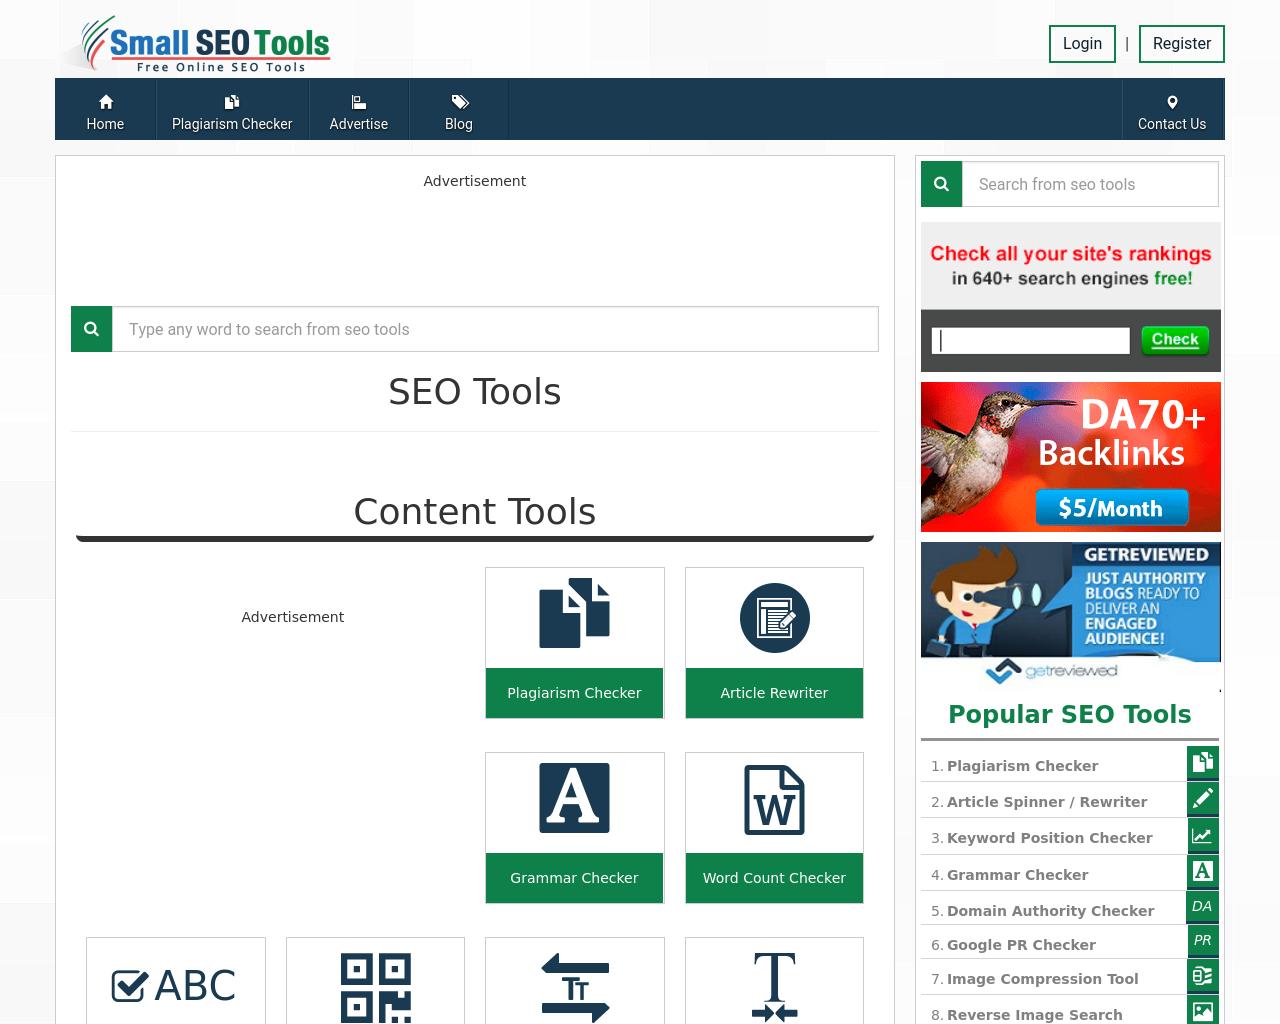 Small-SEO-Tools-Advertising-Reviews-Pricing